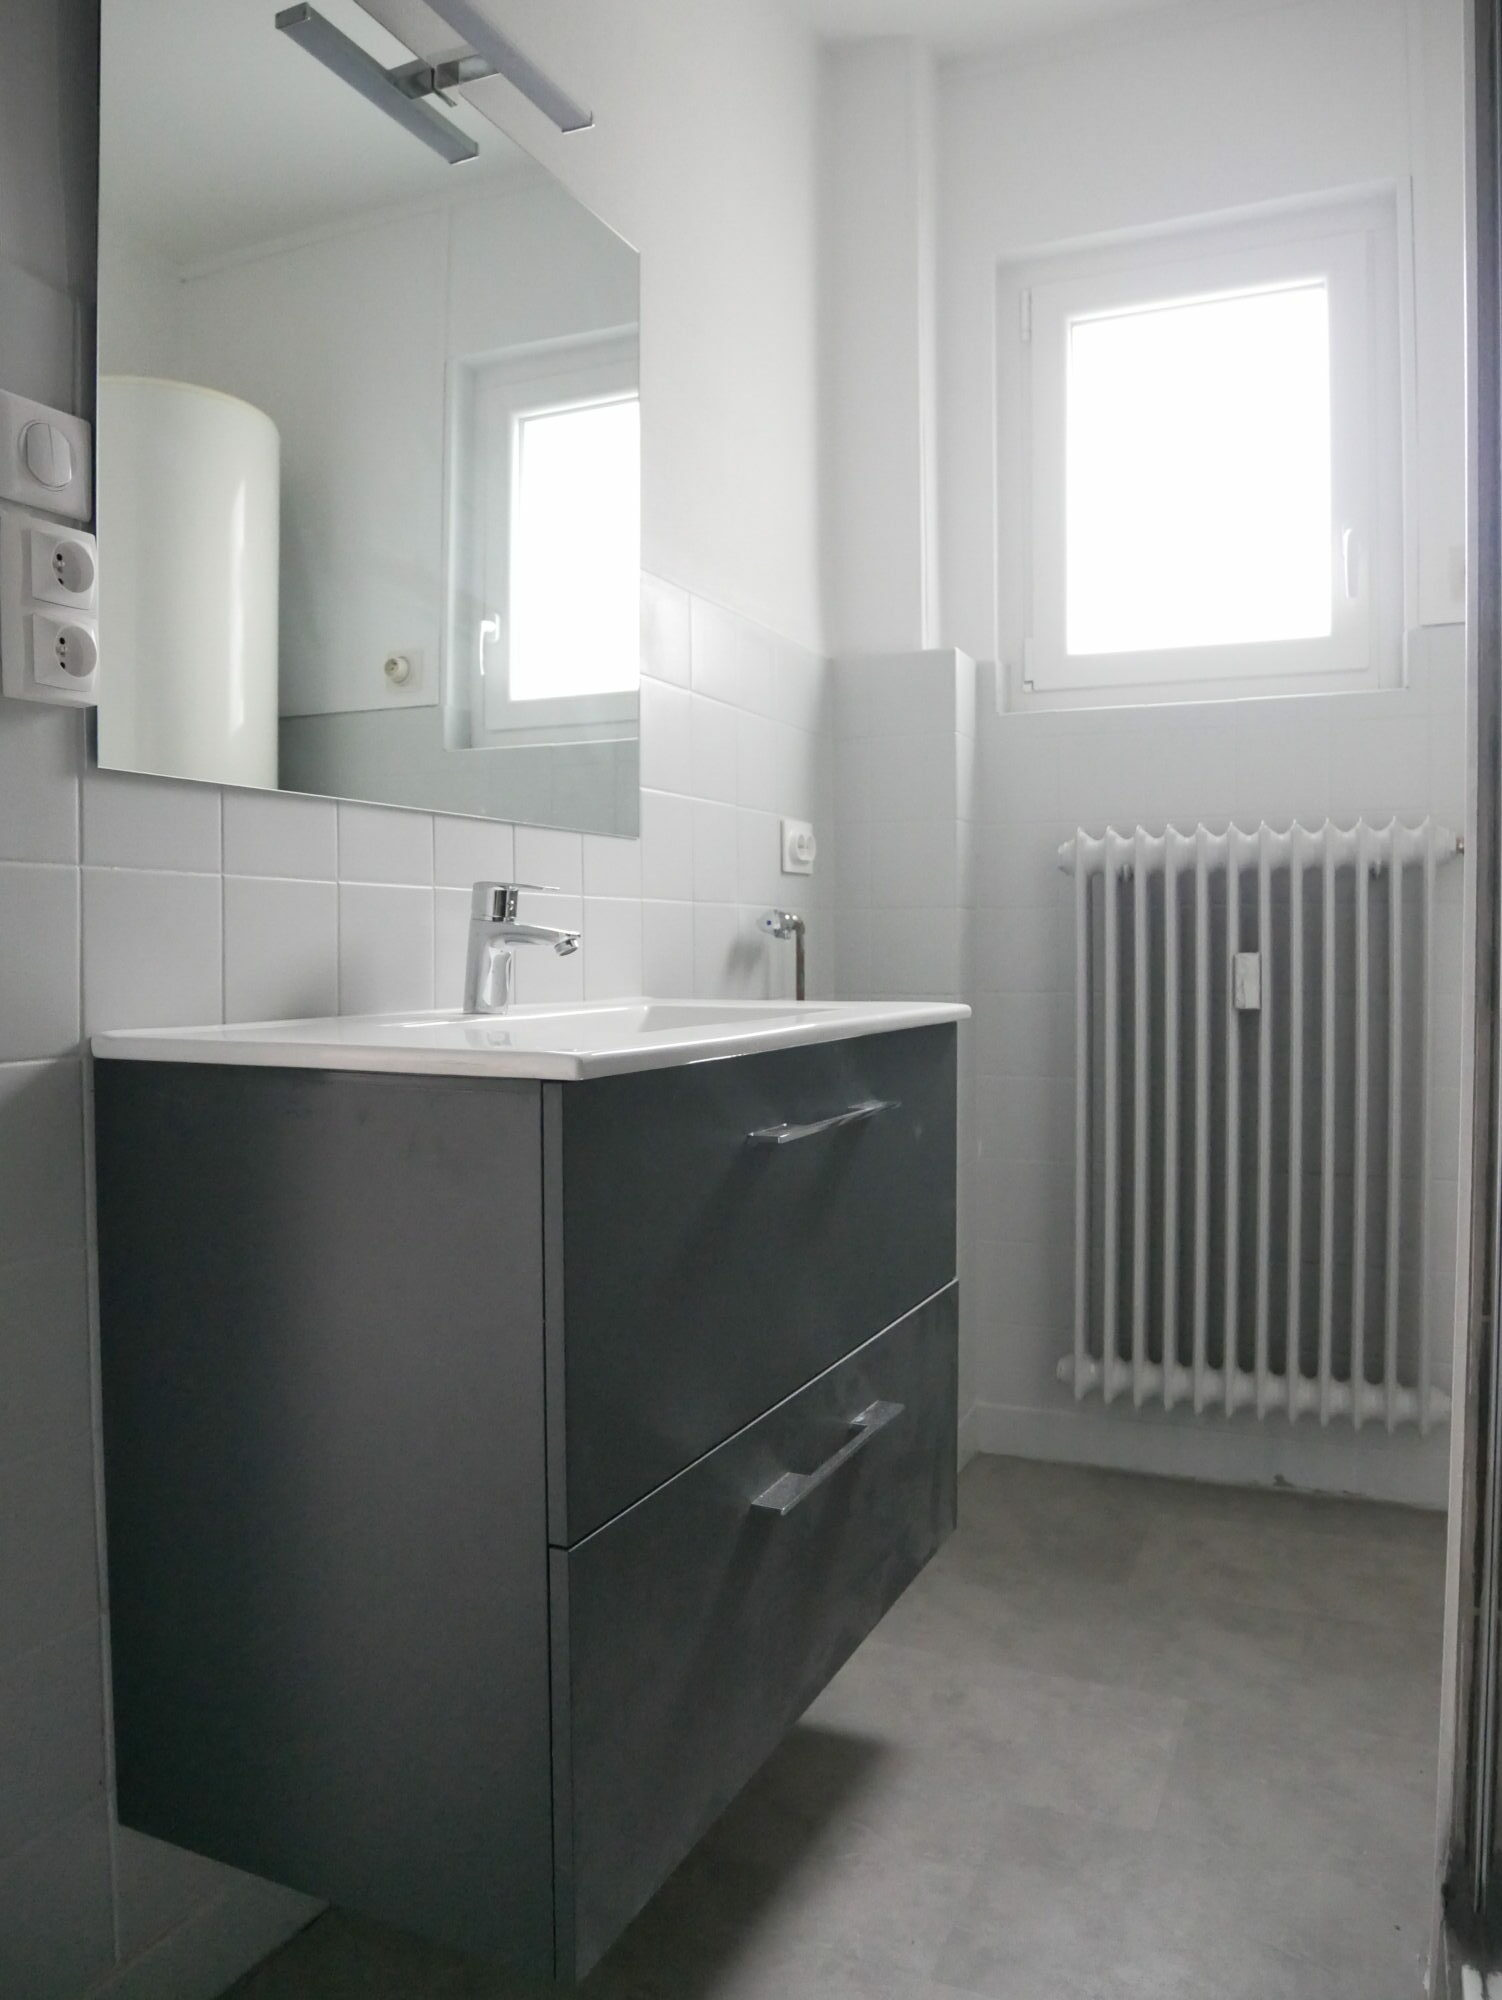 Lumineux appartement 3 pièces avec balcon - Strasbourg / Neudorf - nos ventes - Beausite Immobilier 7